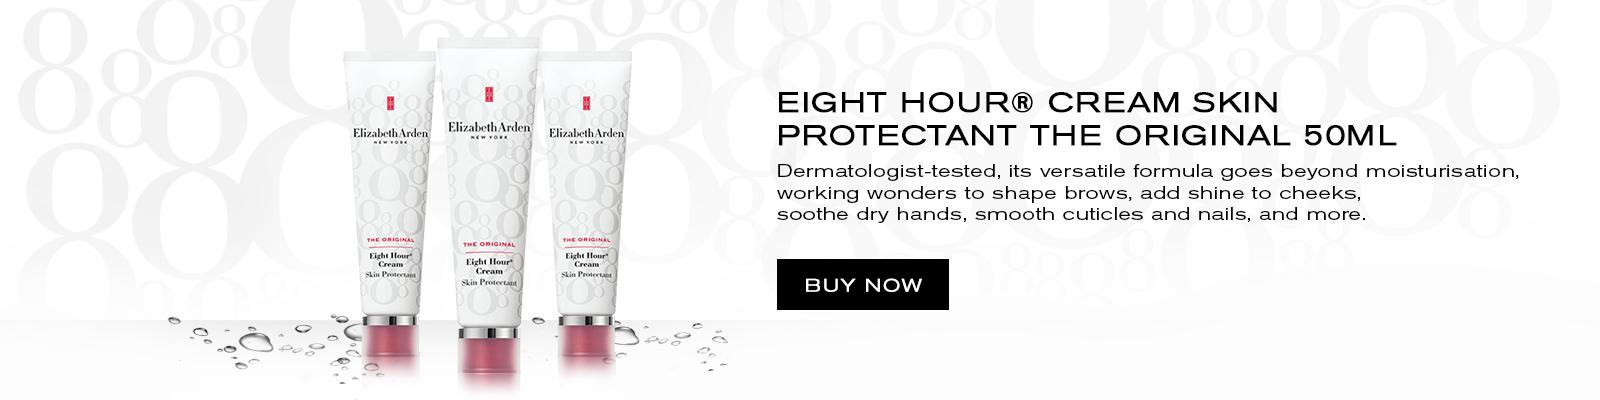 Elizabeth Arden Star Product 5